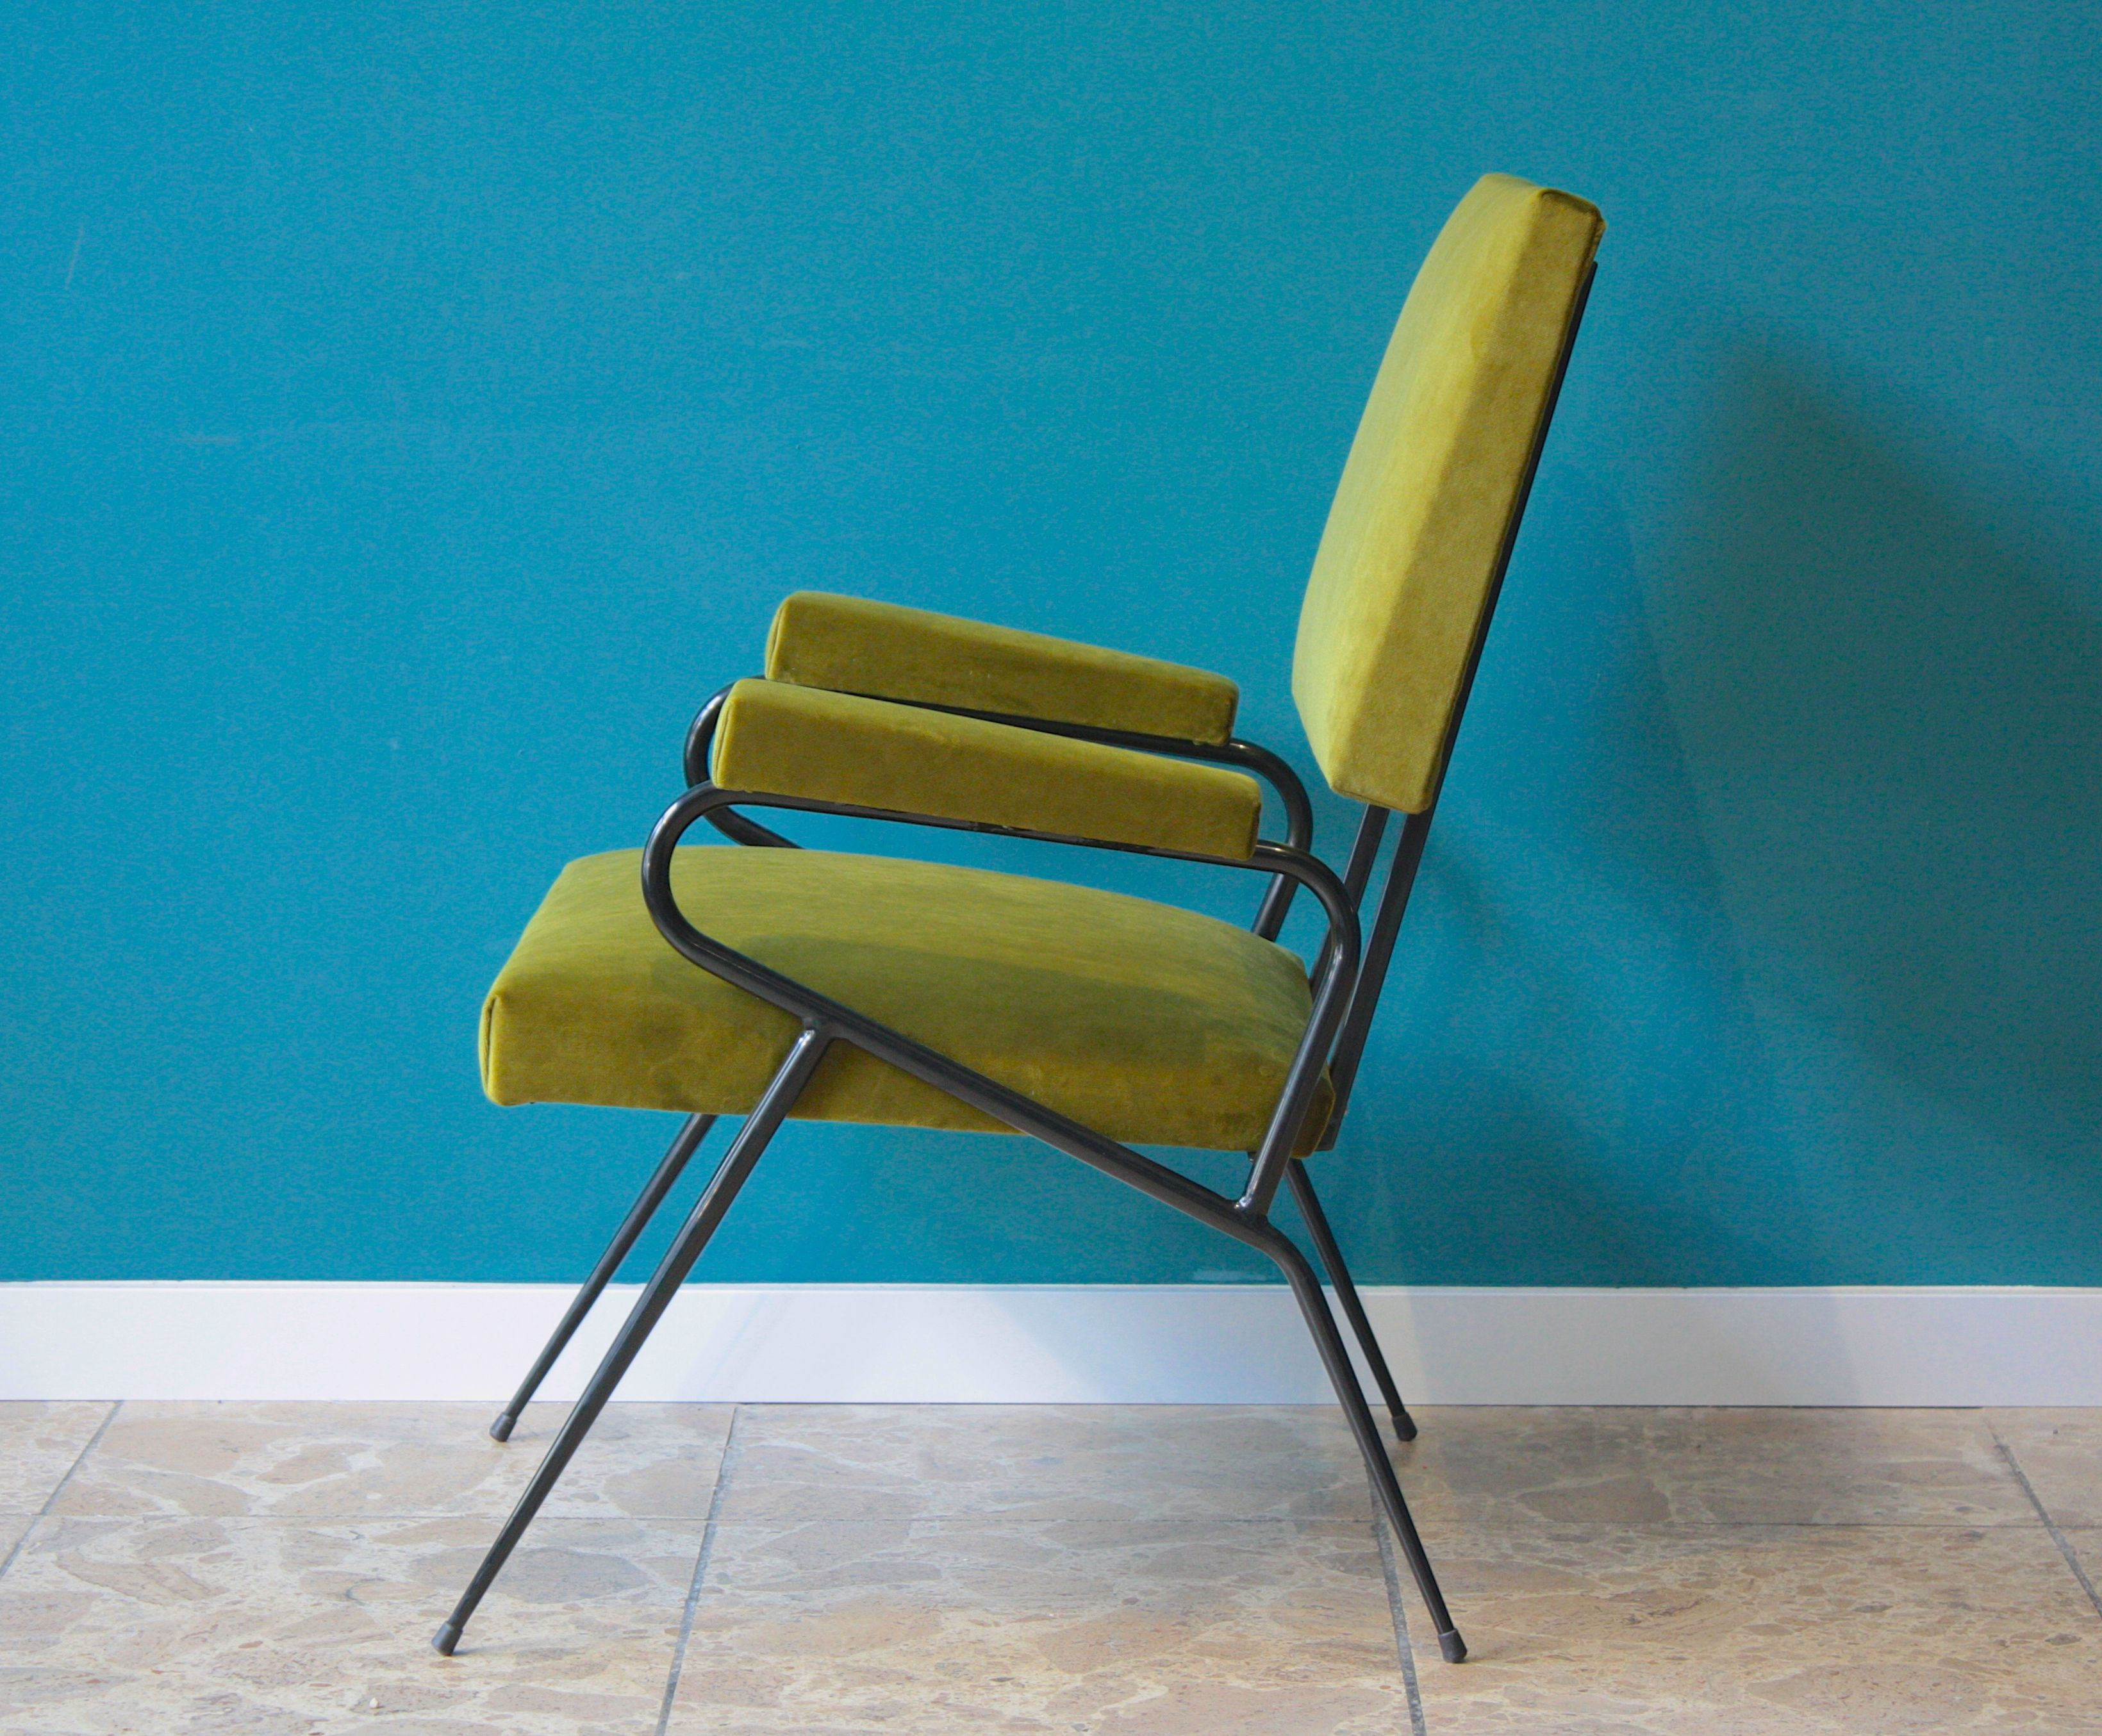 Vintage Italian Chair Ca 1950 Ies Reupholstered Coroto  # Muebles Corotos